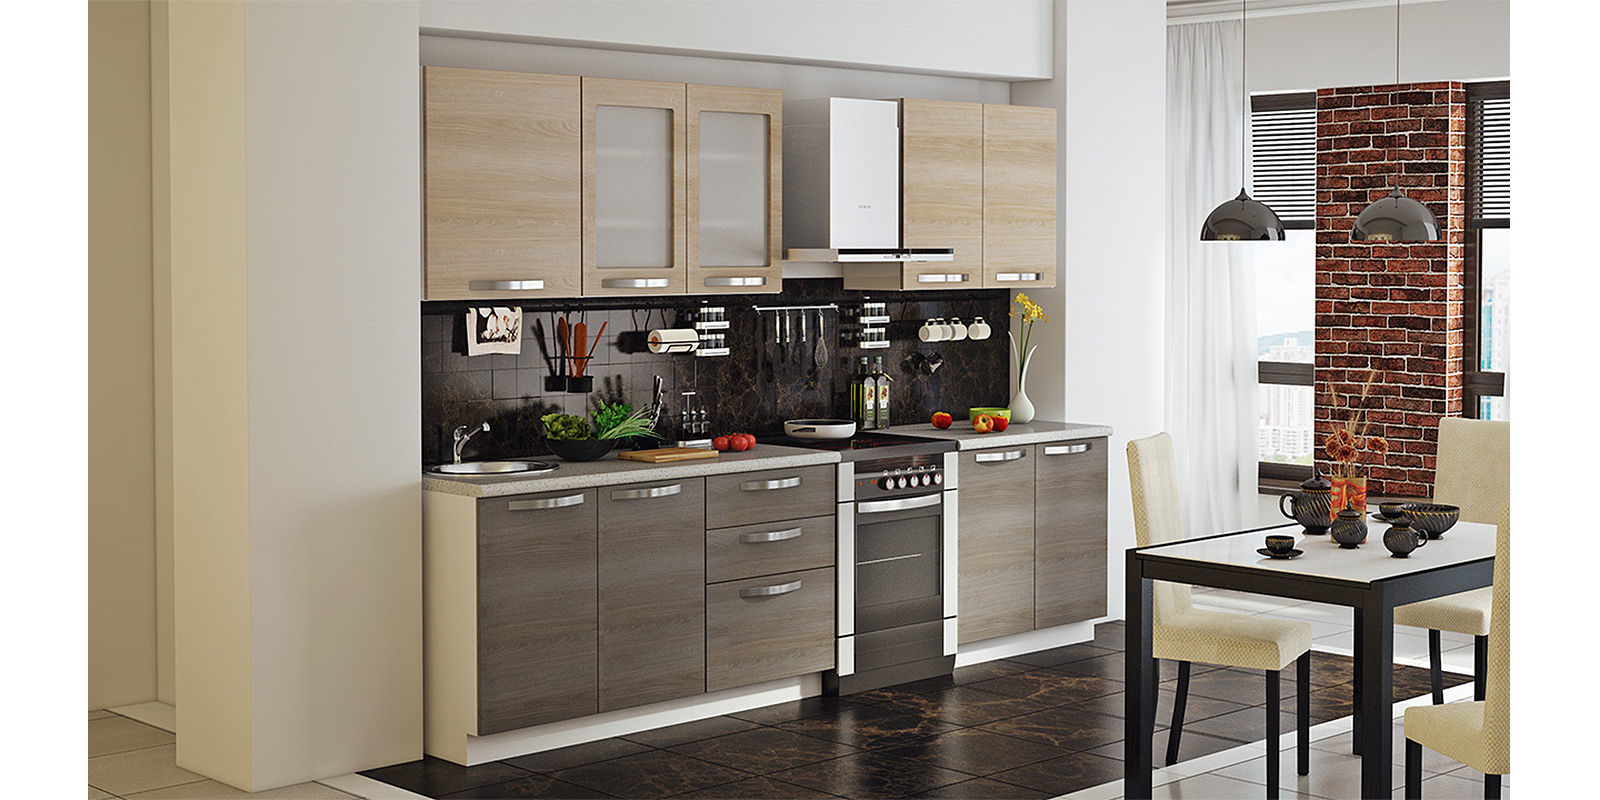 Кухонный гарнитур HomeMe Миранда ли миранда на пределе чувства